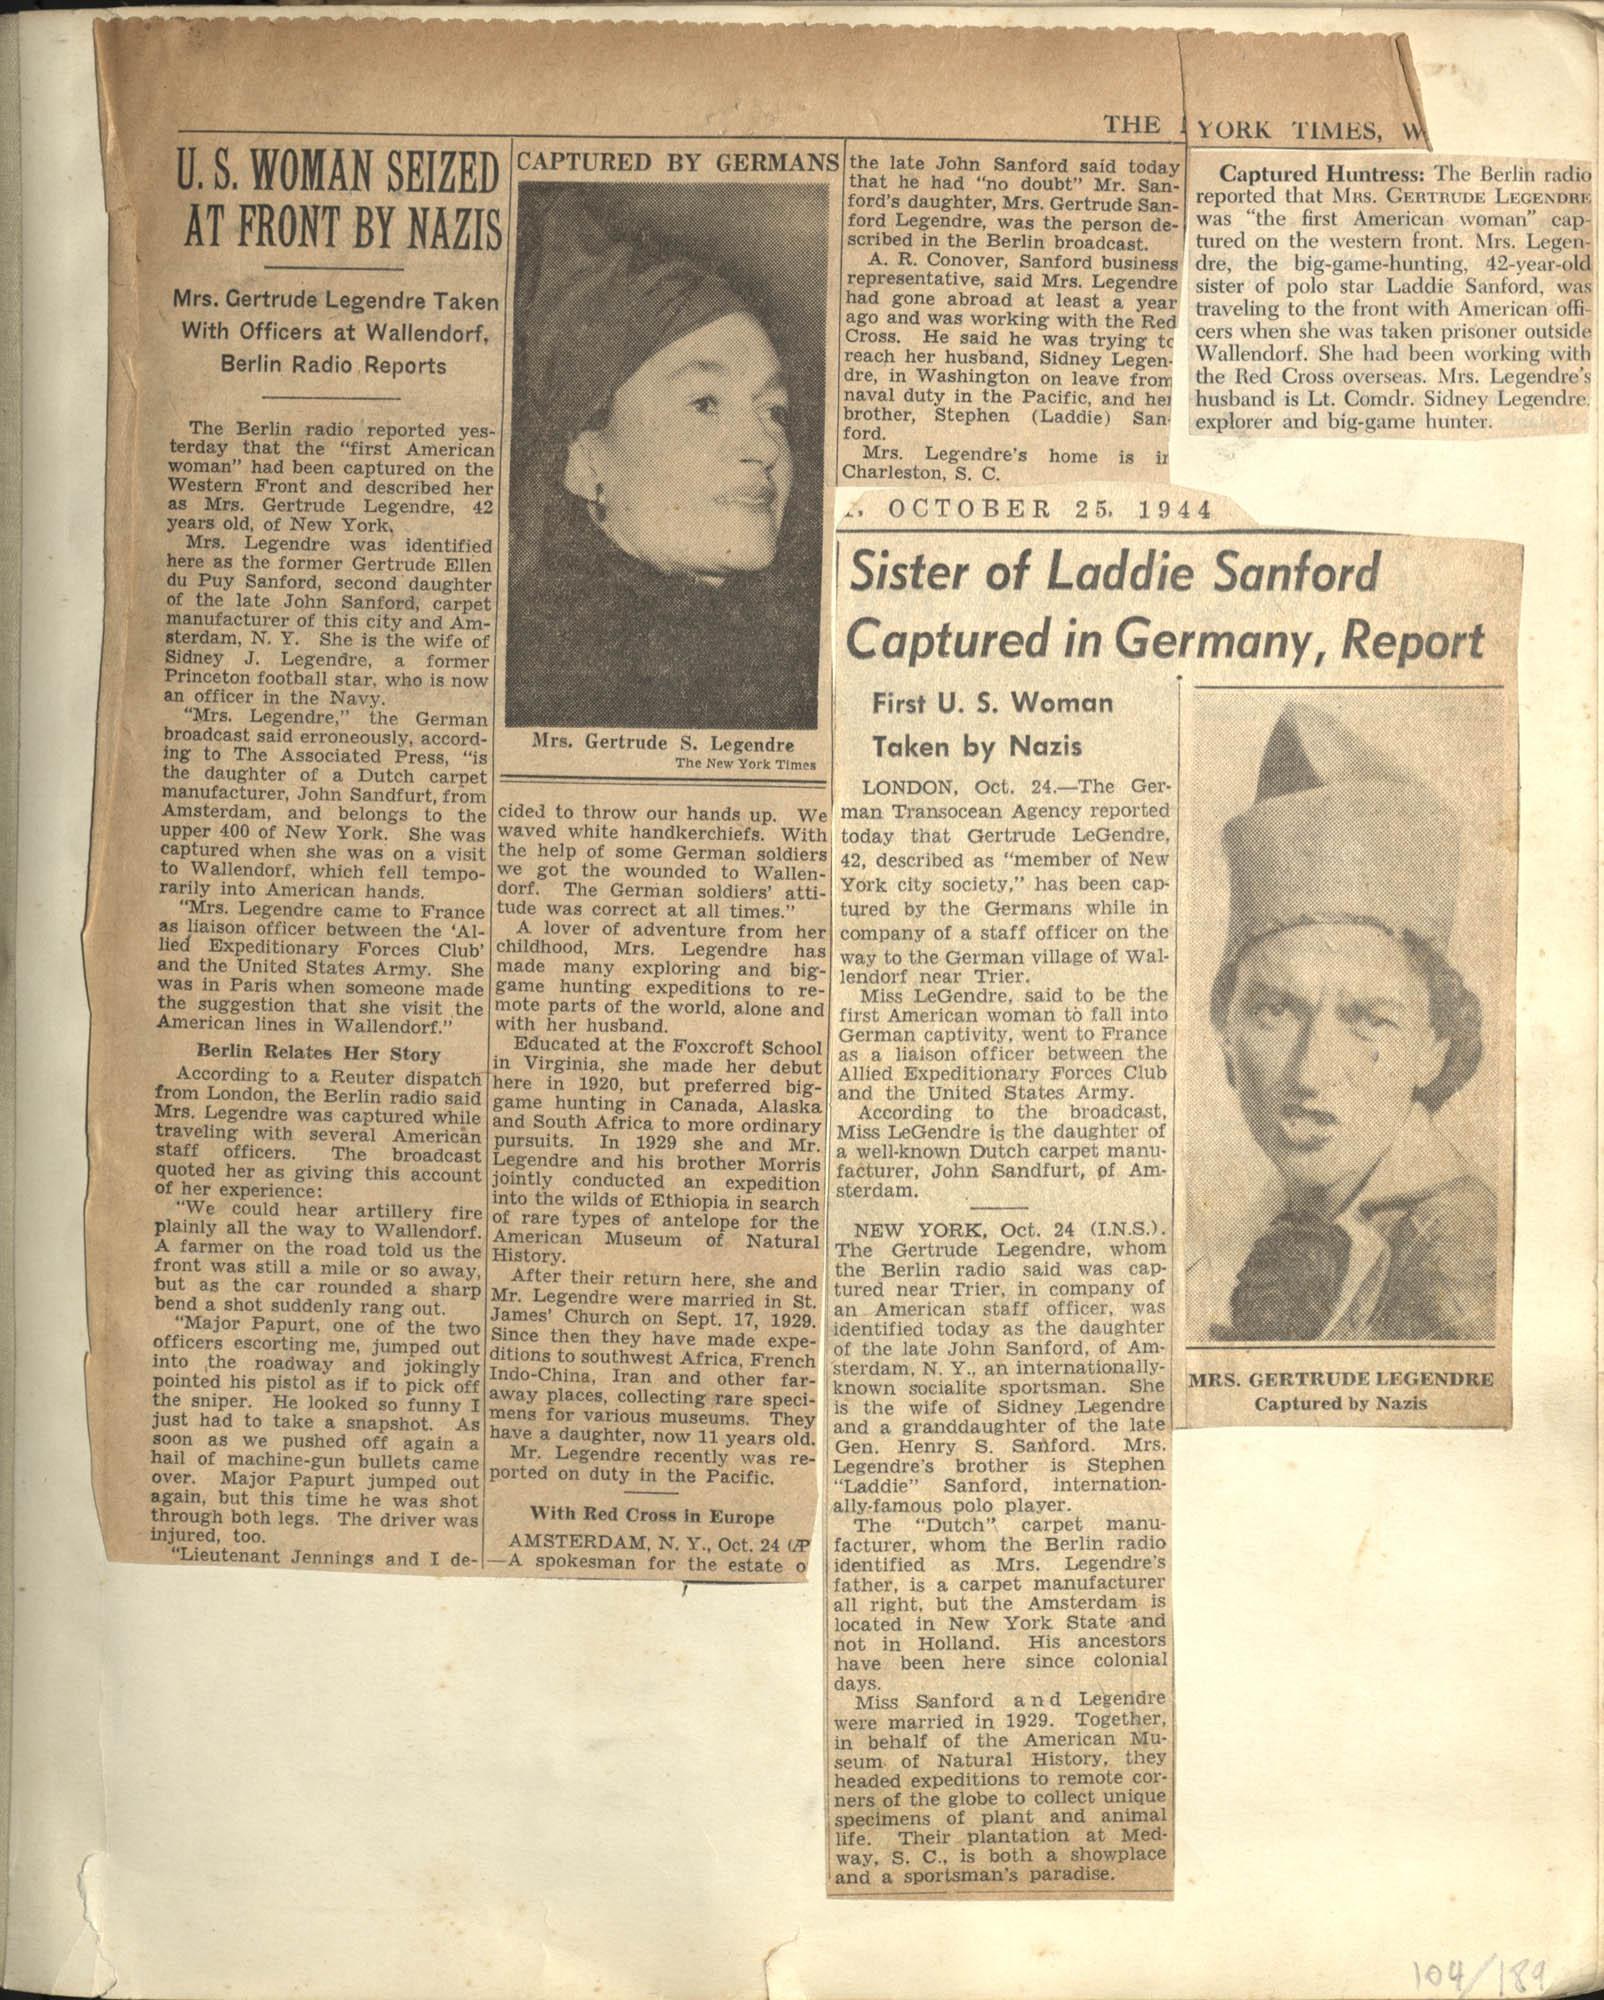 Gertrude Legendre OSS Scrapbook, 1944, Page 104